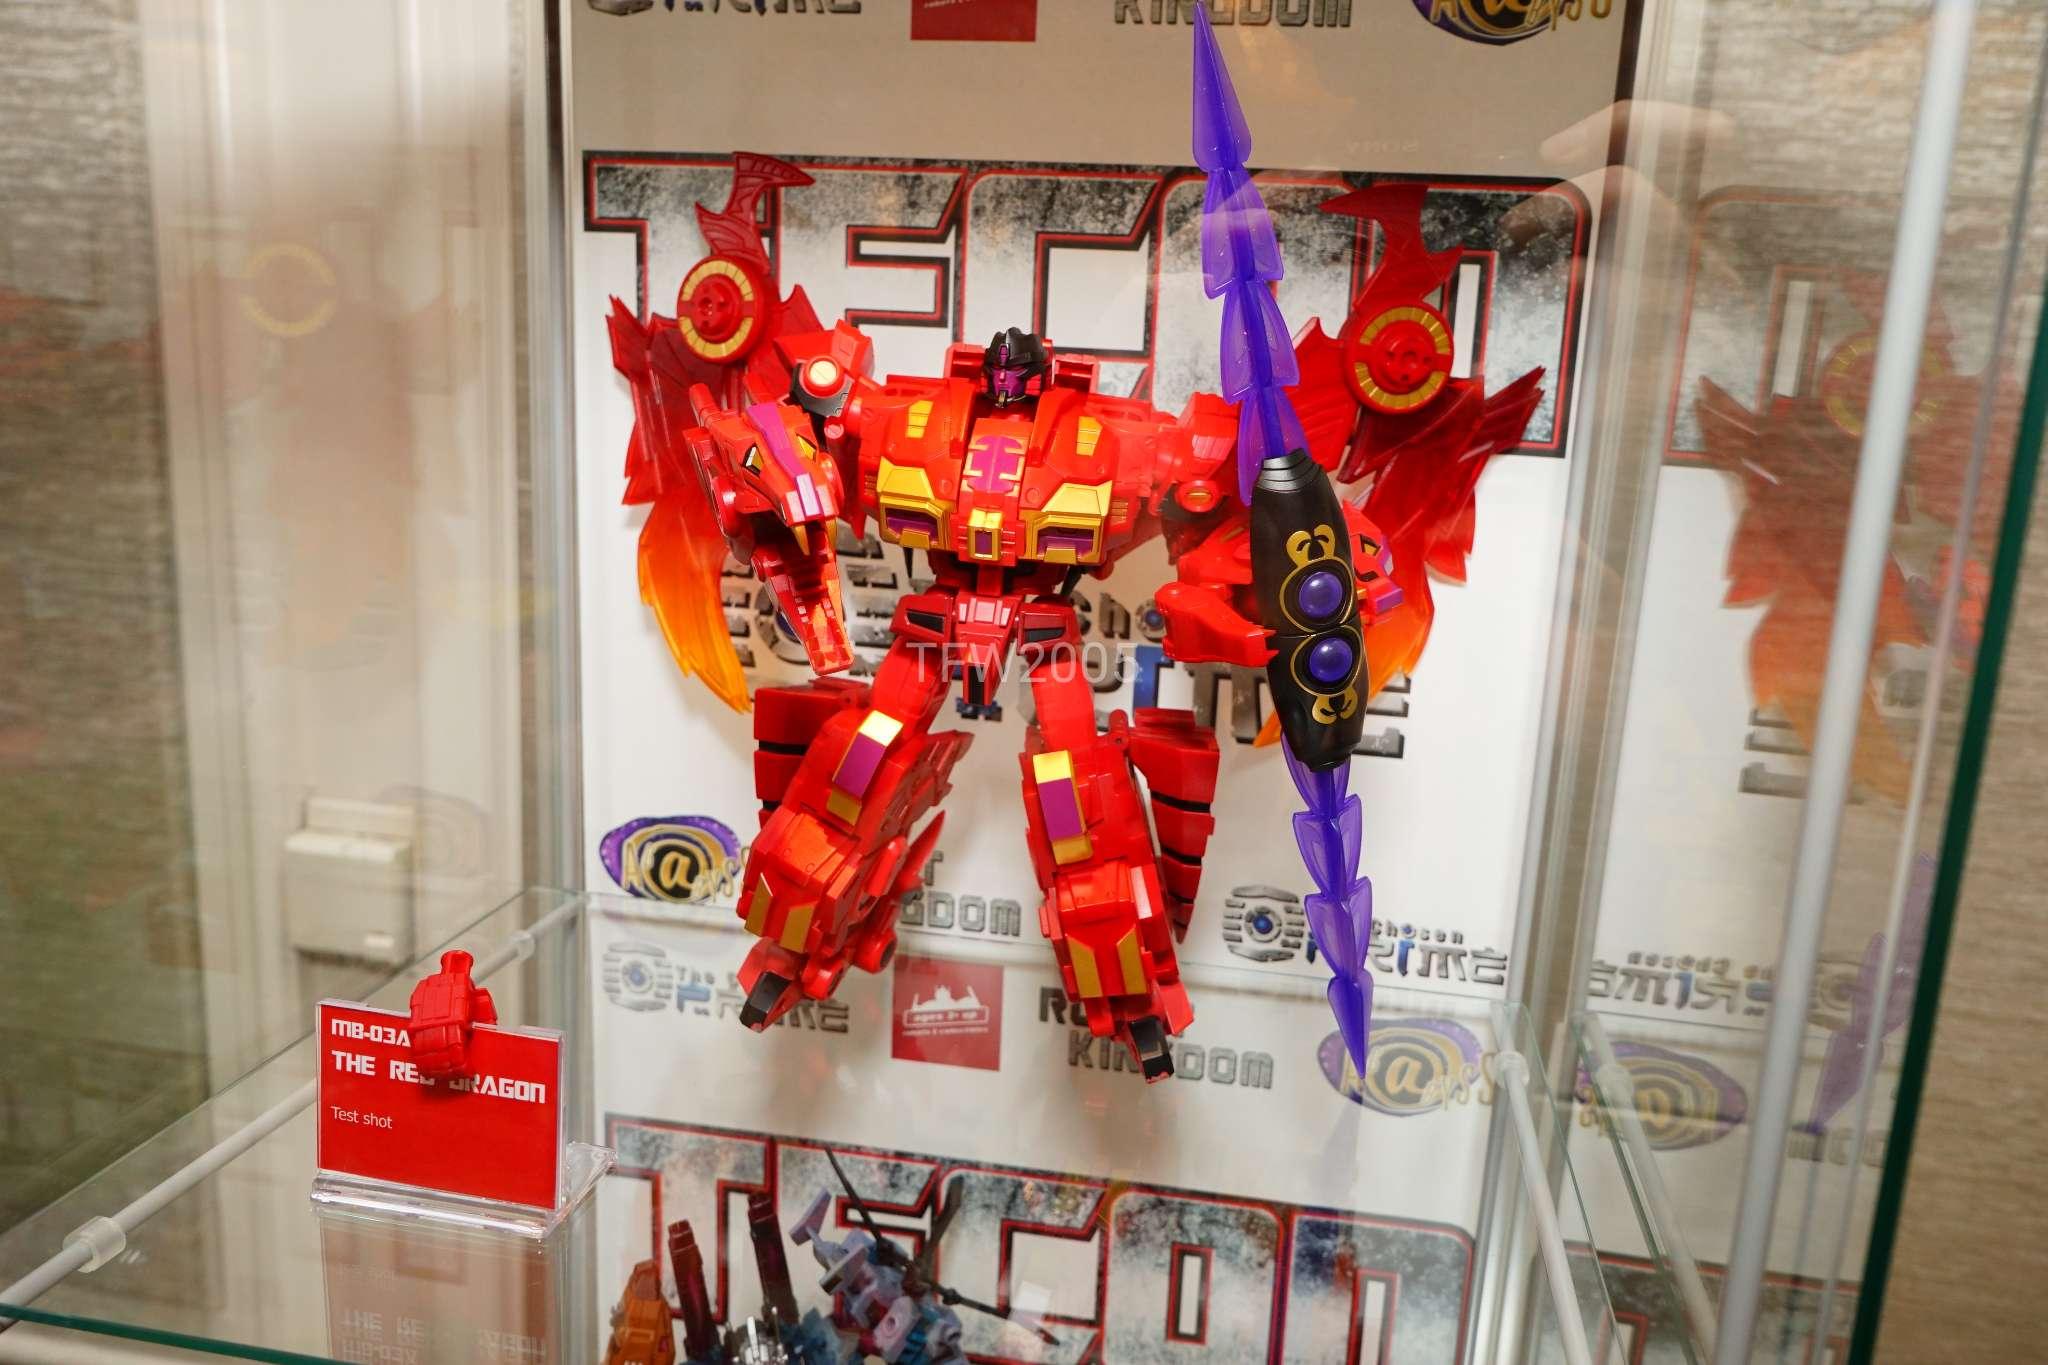 [FansHobby] Produit Tiers - Master Builder MB-03A Red Dragon - aka Transmetal 2 Mégatron (Beast Wars S3) BqcbtN8k_o